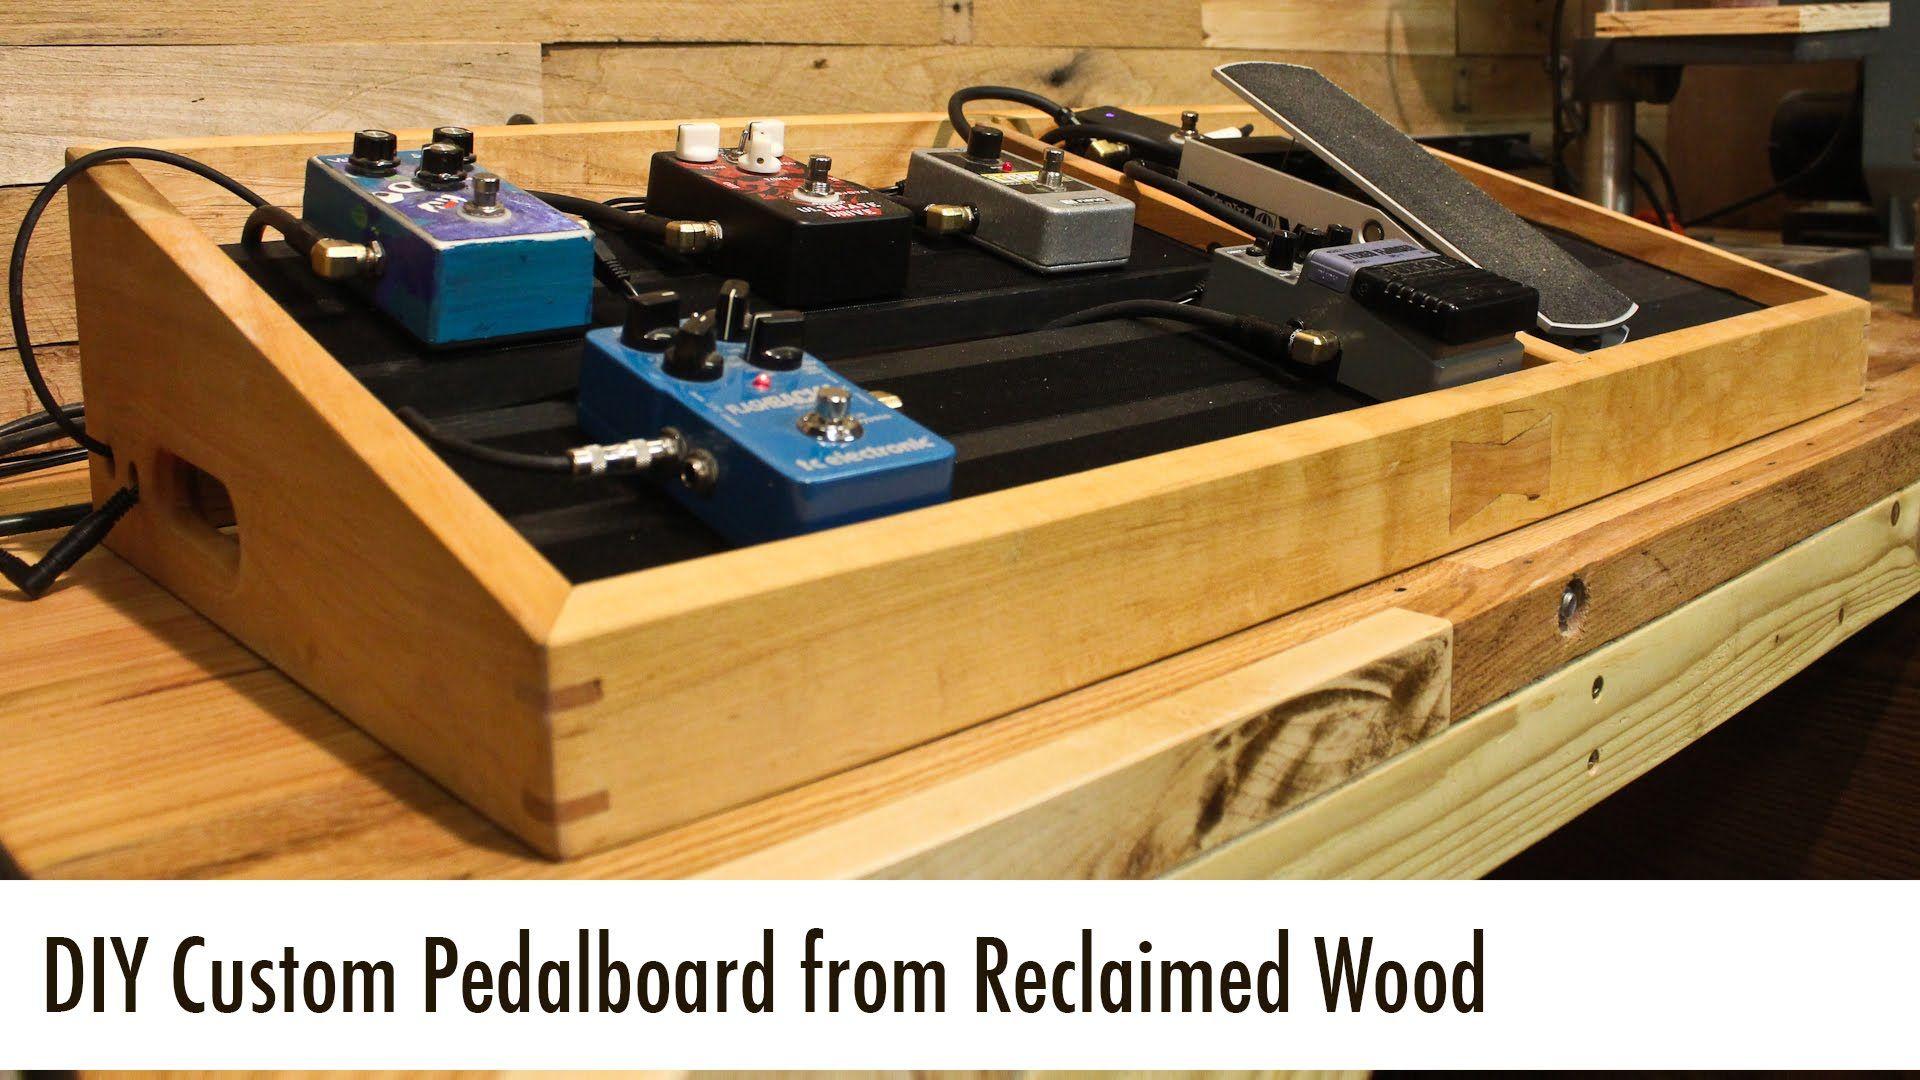 Reclaimed Wood Projects Diy Custom Pedalboard From Reclaimed Wood Projects Pinterest